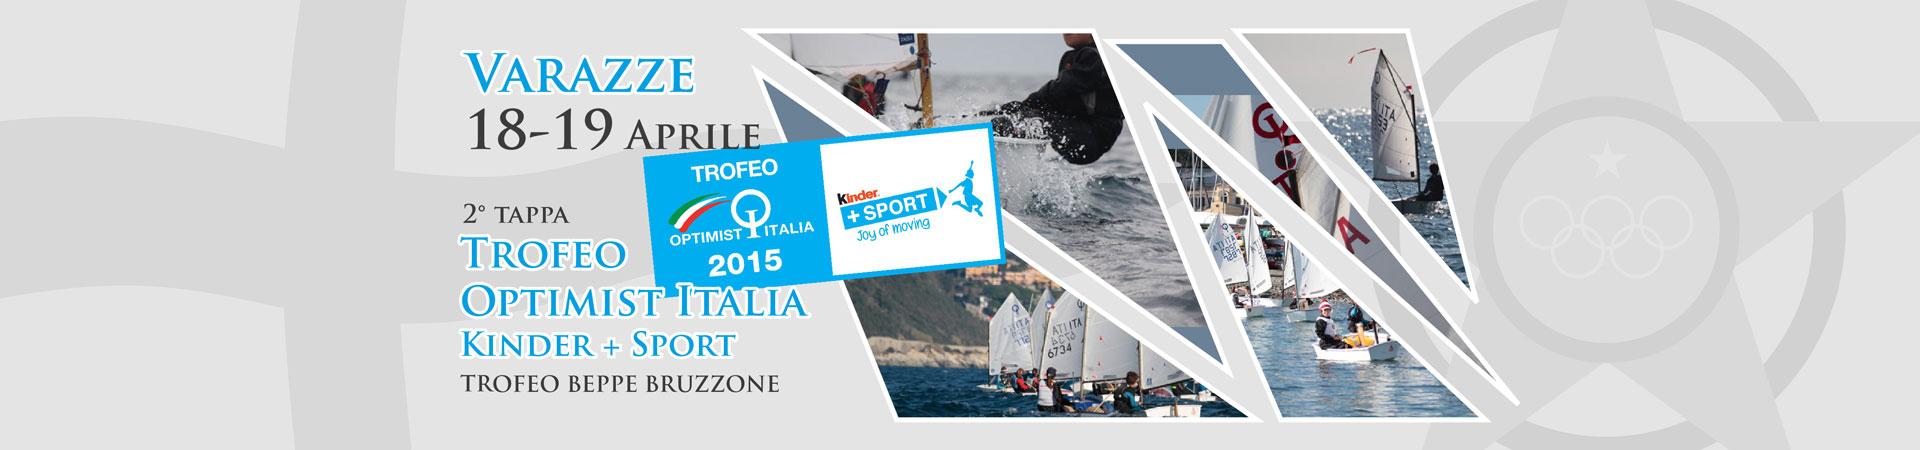 Trofeo Optimist Italia 2015 Kinder + Sport Trofeo Beppe Bruzzone